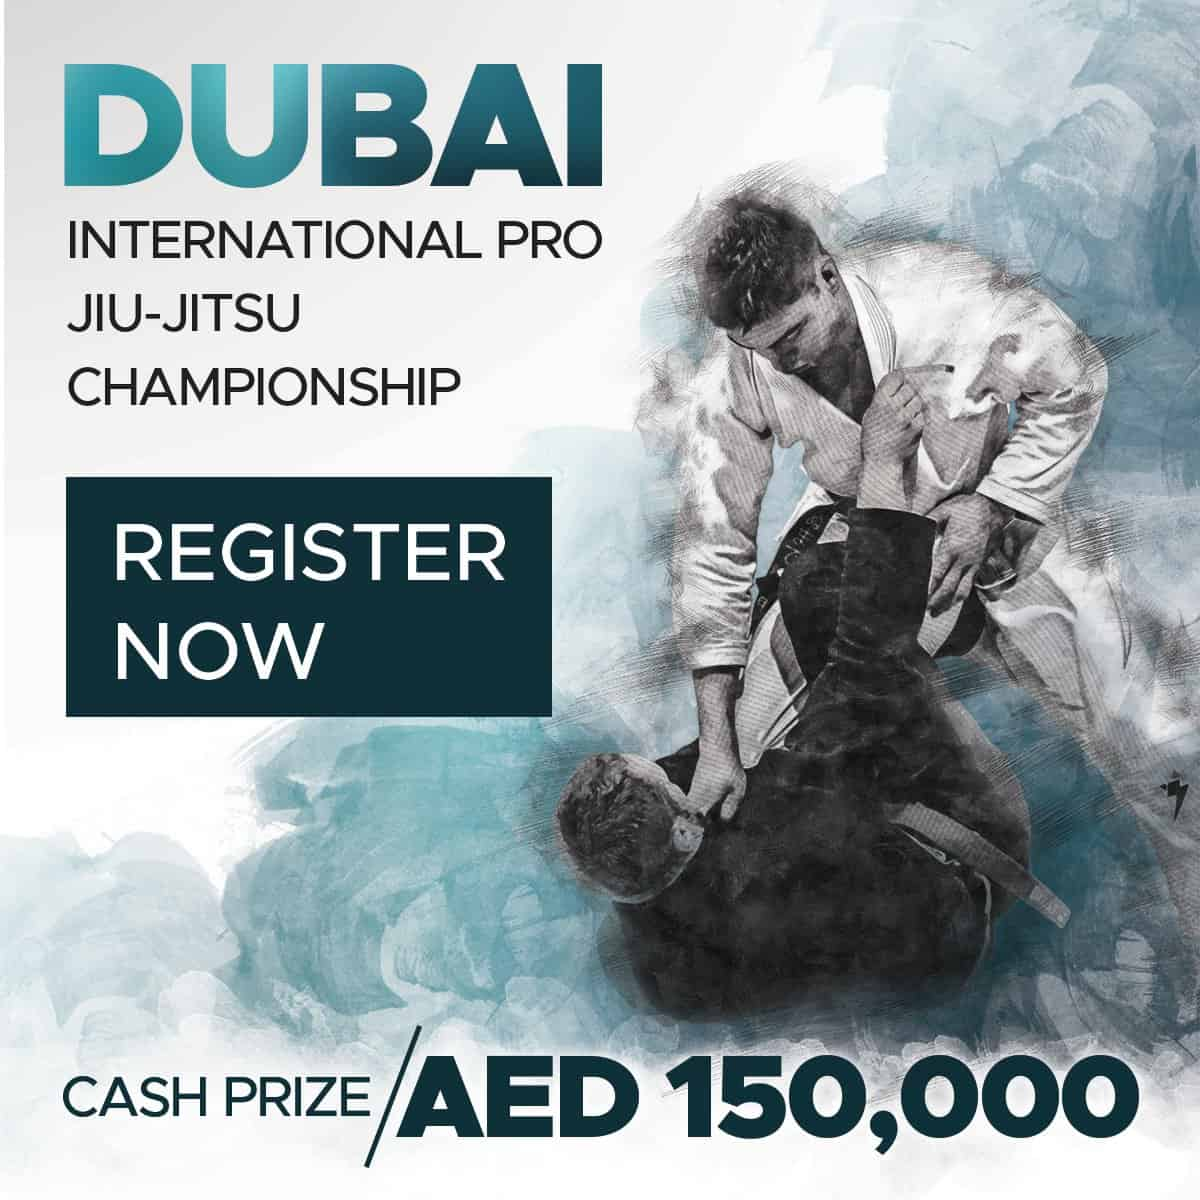 Dubai International pro jiu jitsu championship uaejjf